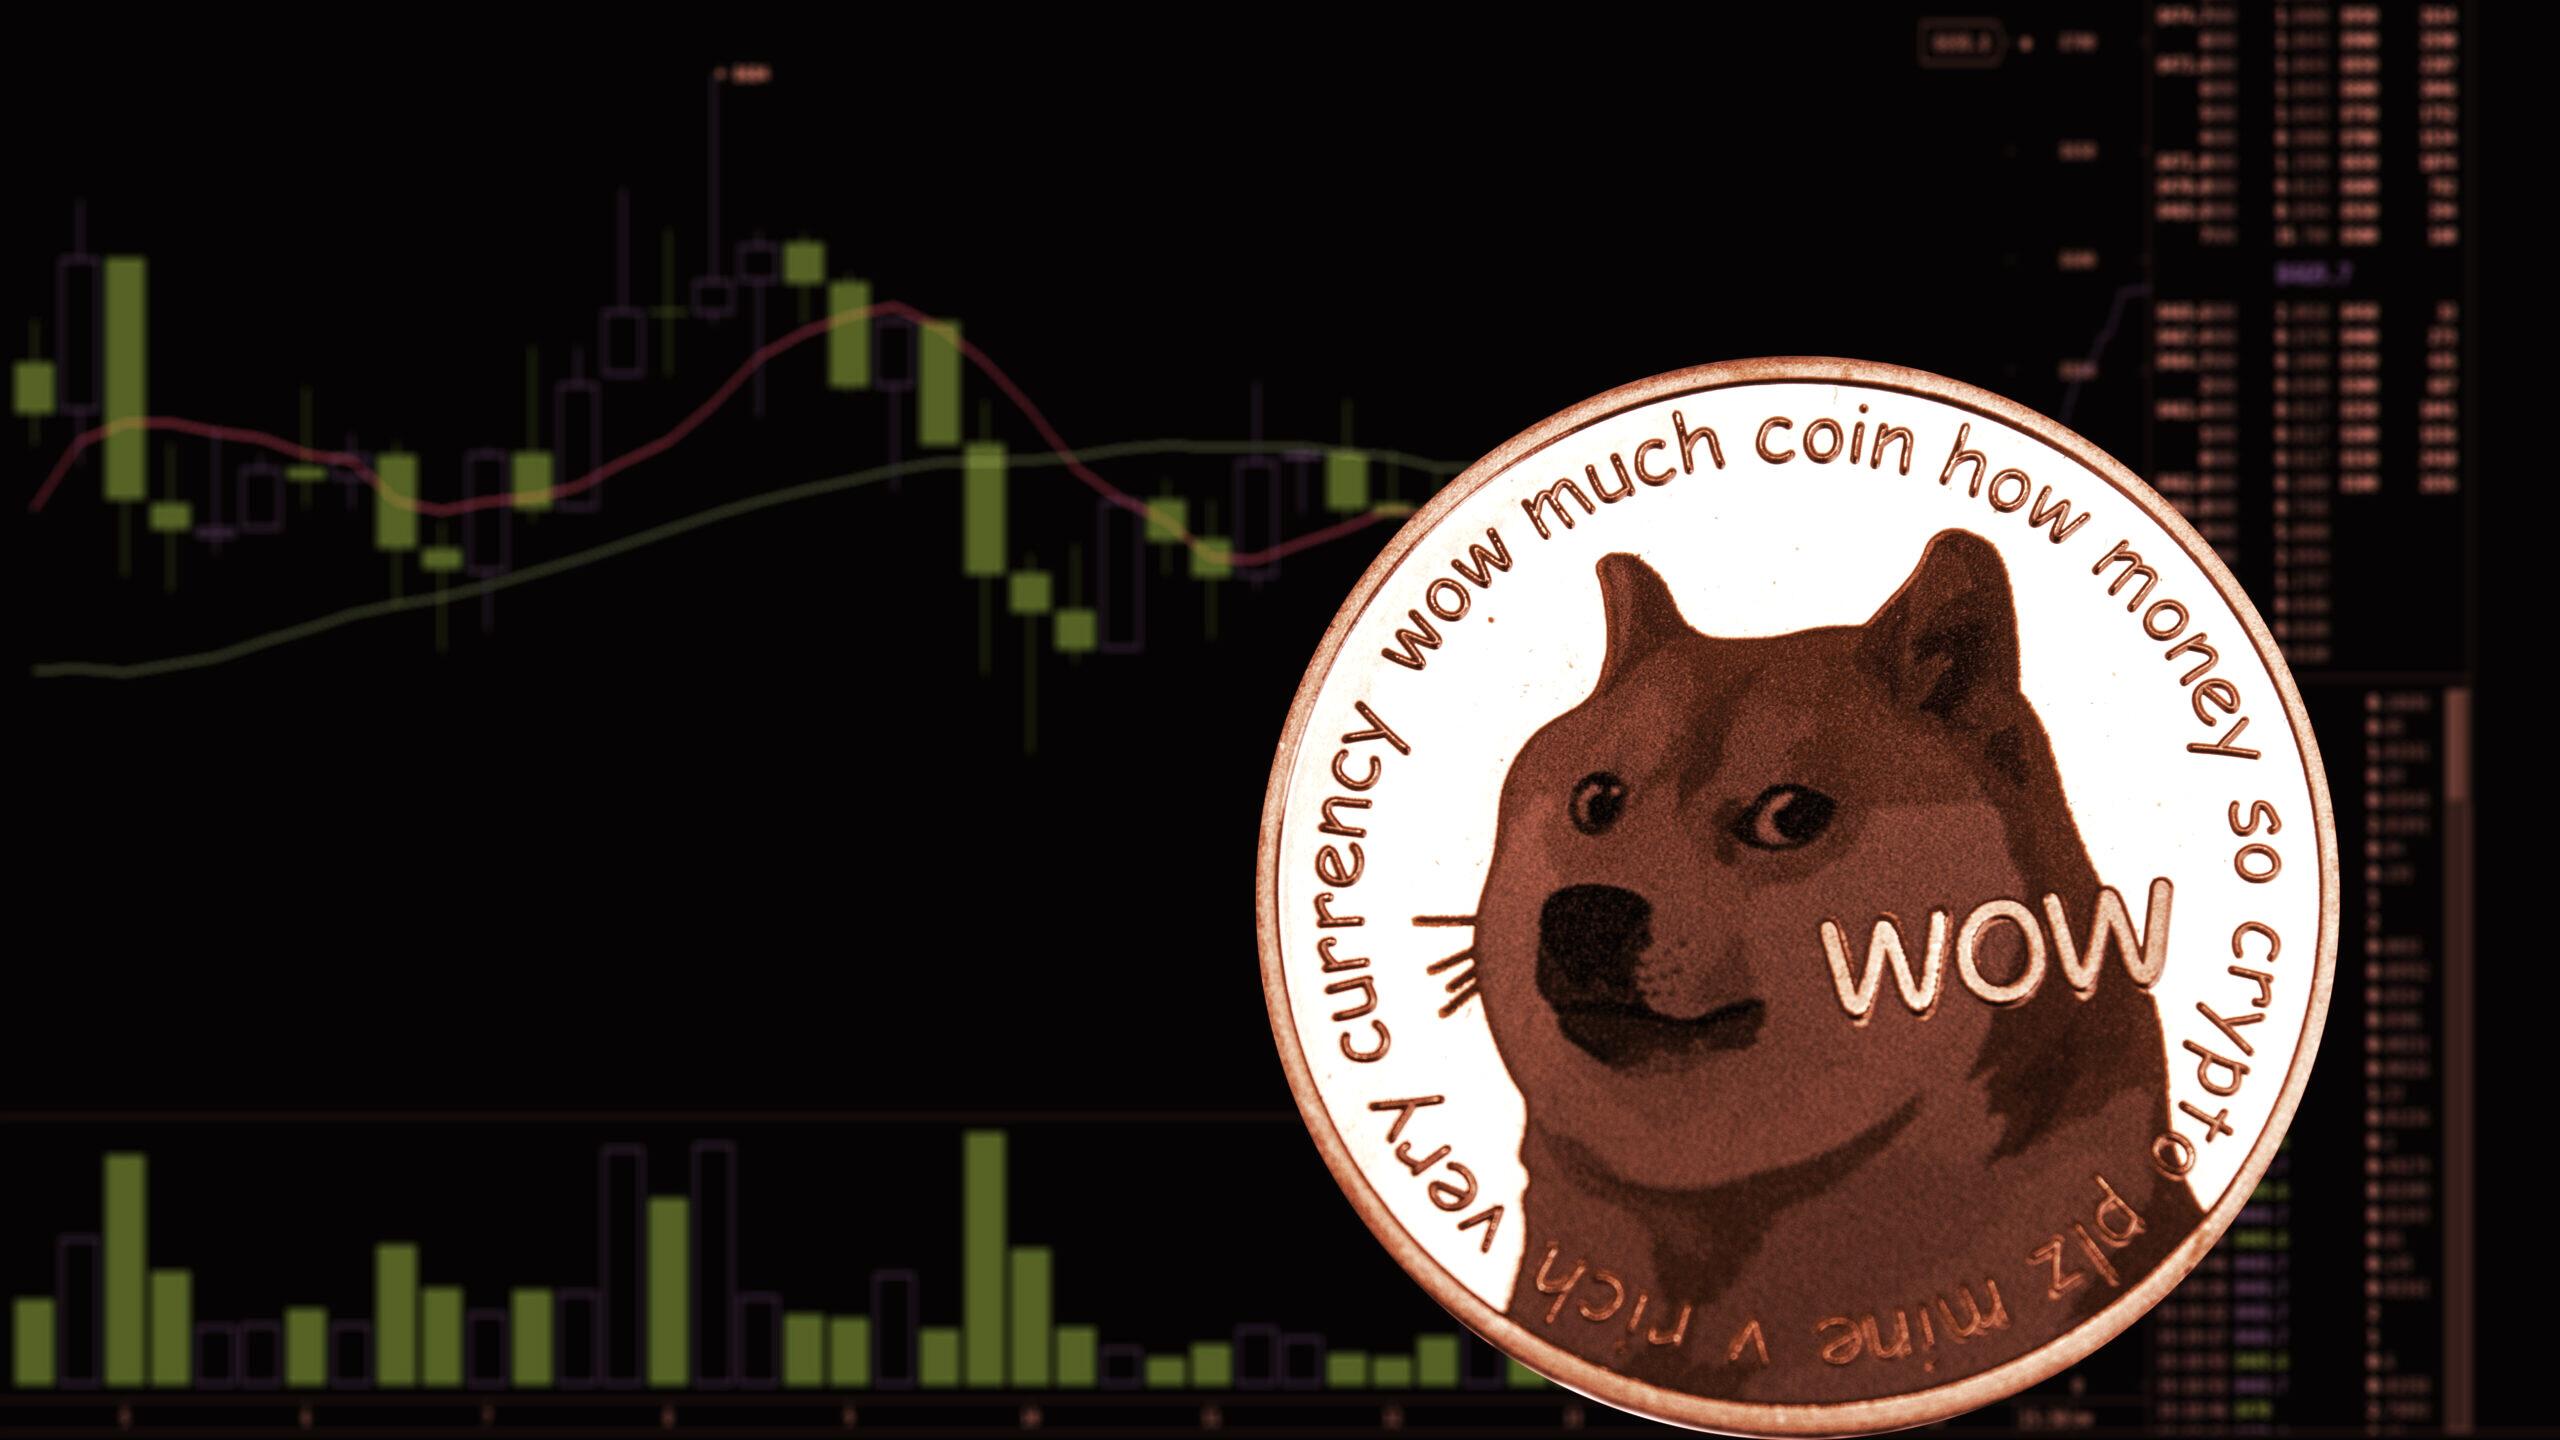 Dogecoin Moons: Market Cap Reaches $41 Billion